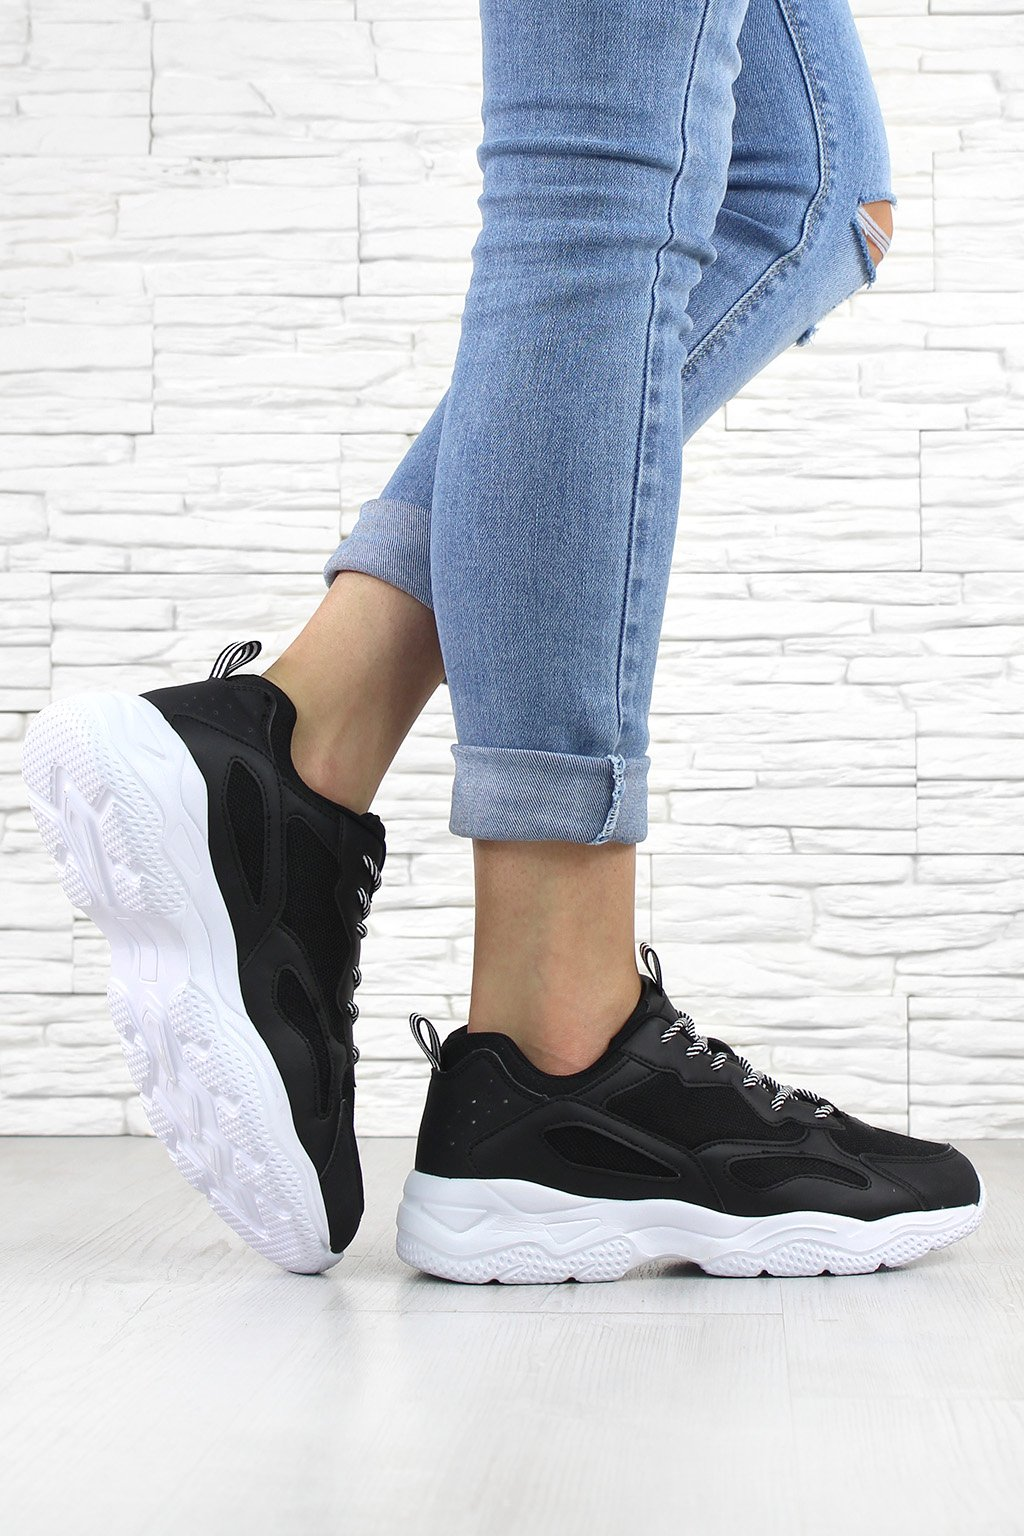 YD06P 1 BLACK WHITE Sneakers (1)